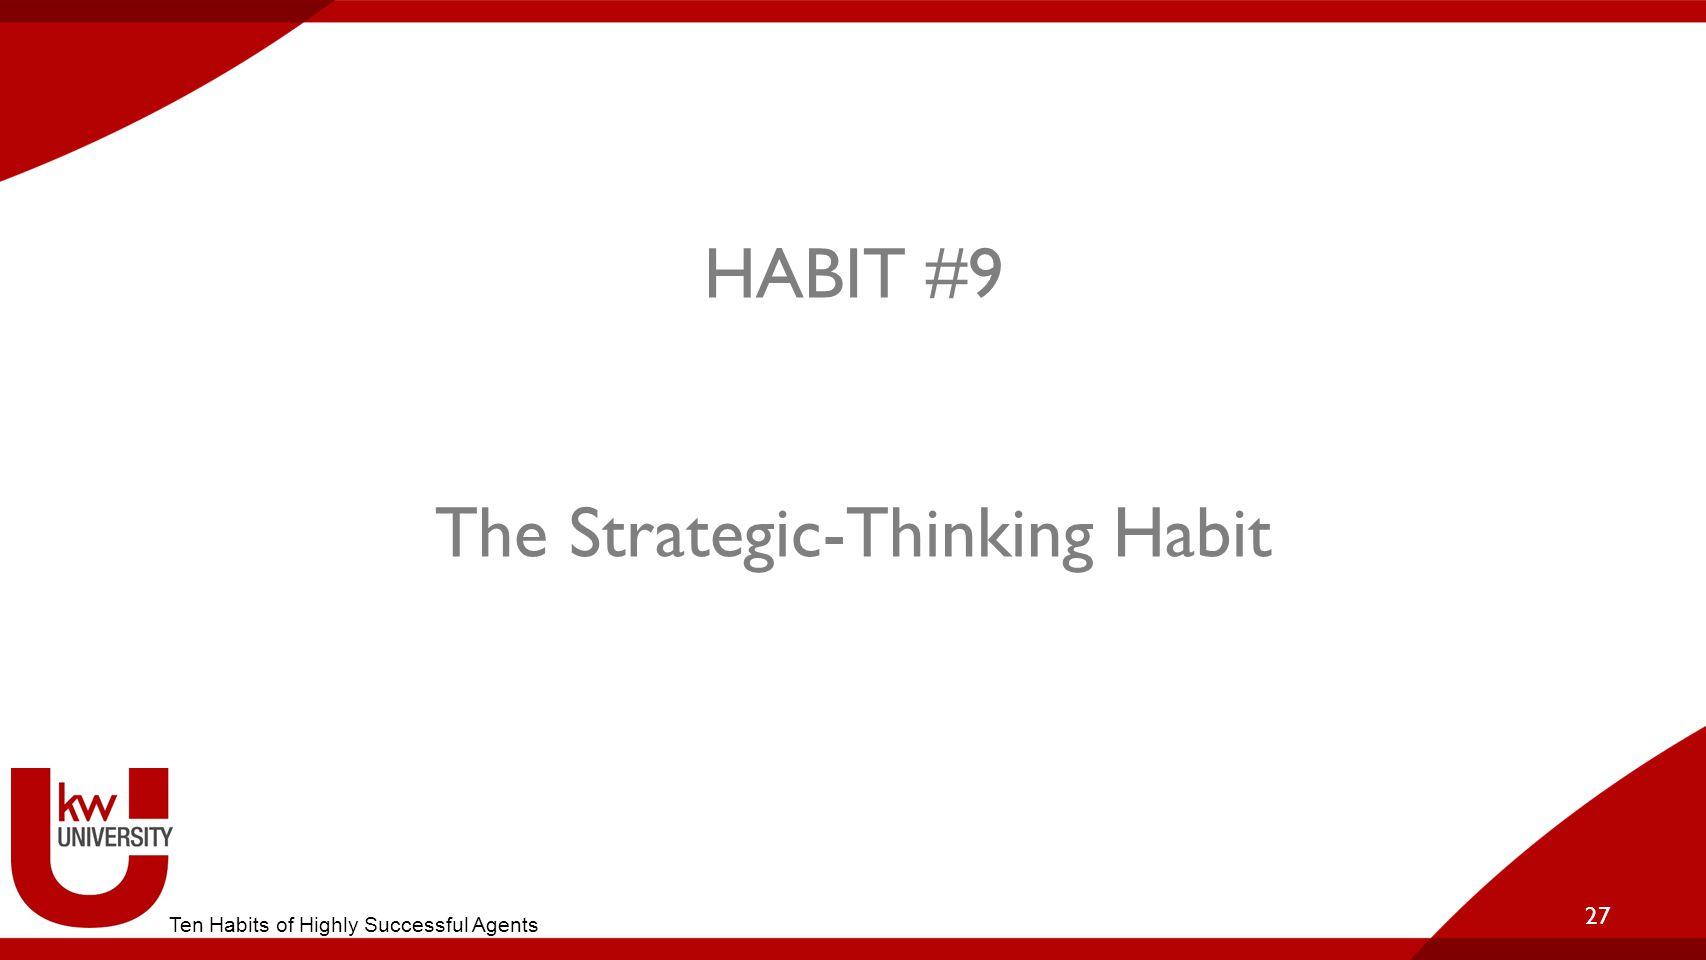 HABIT #9 The Strategic-Thinking Habit